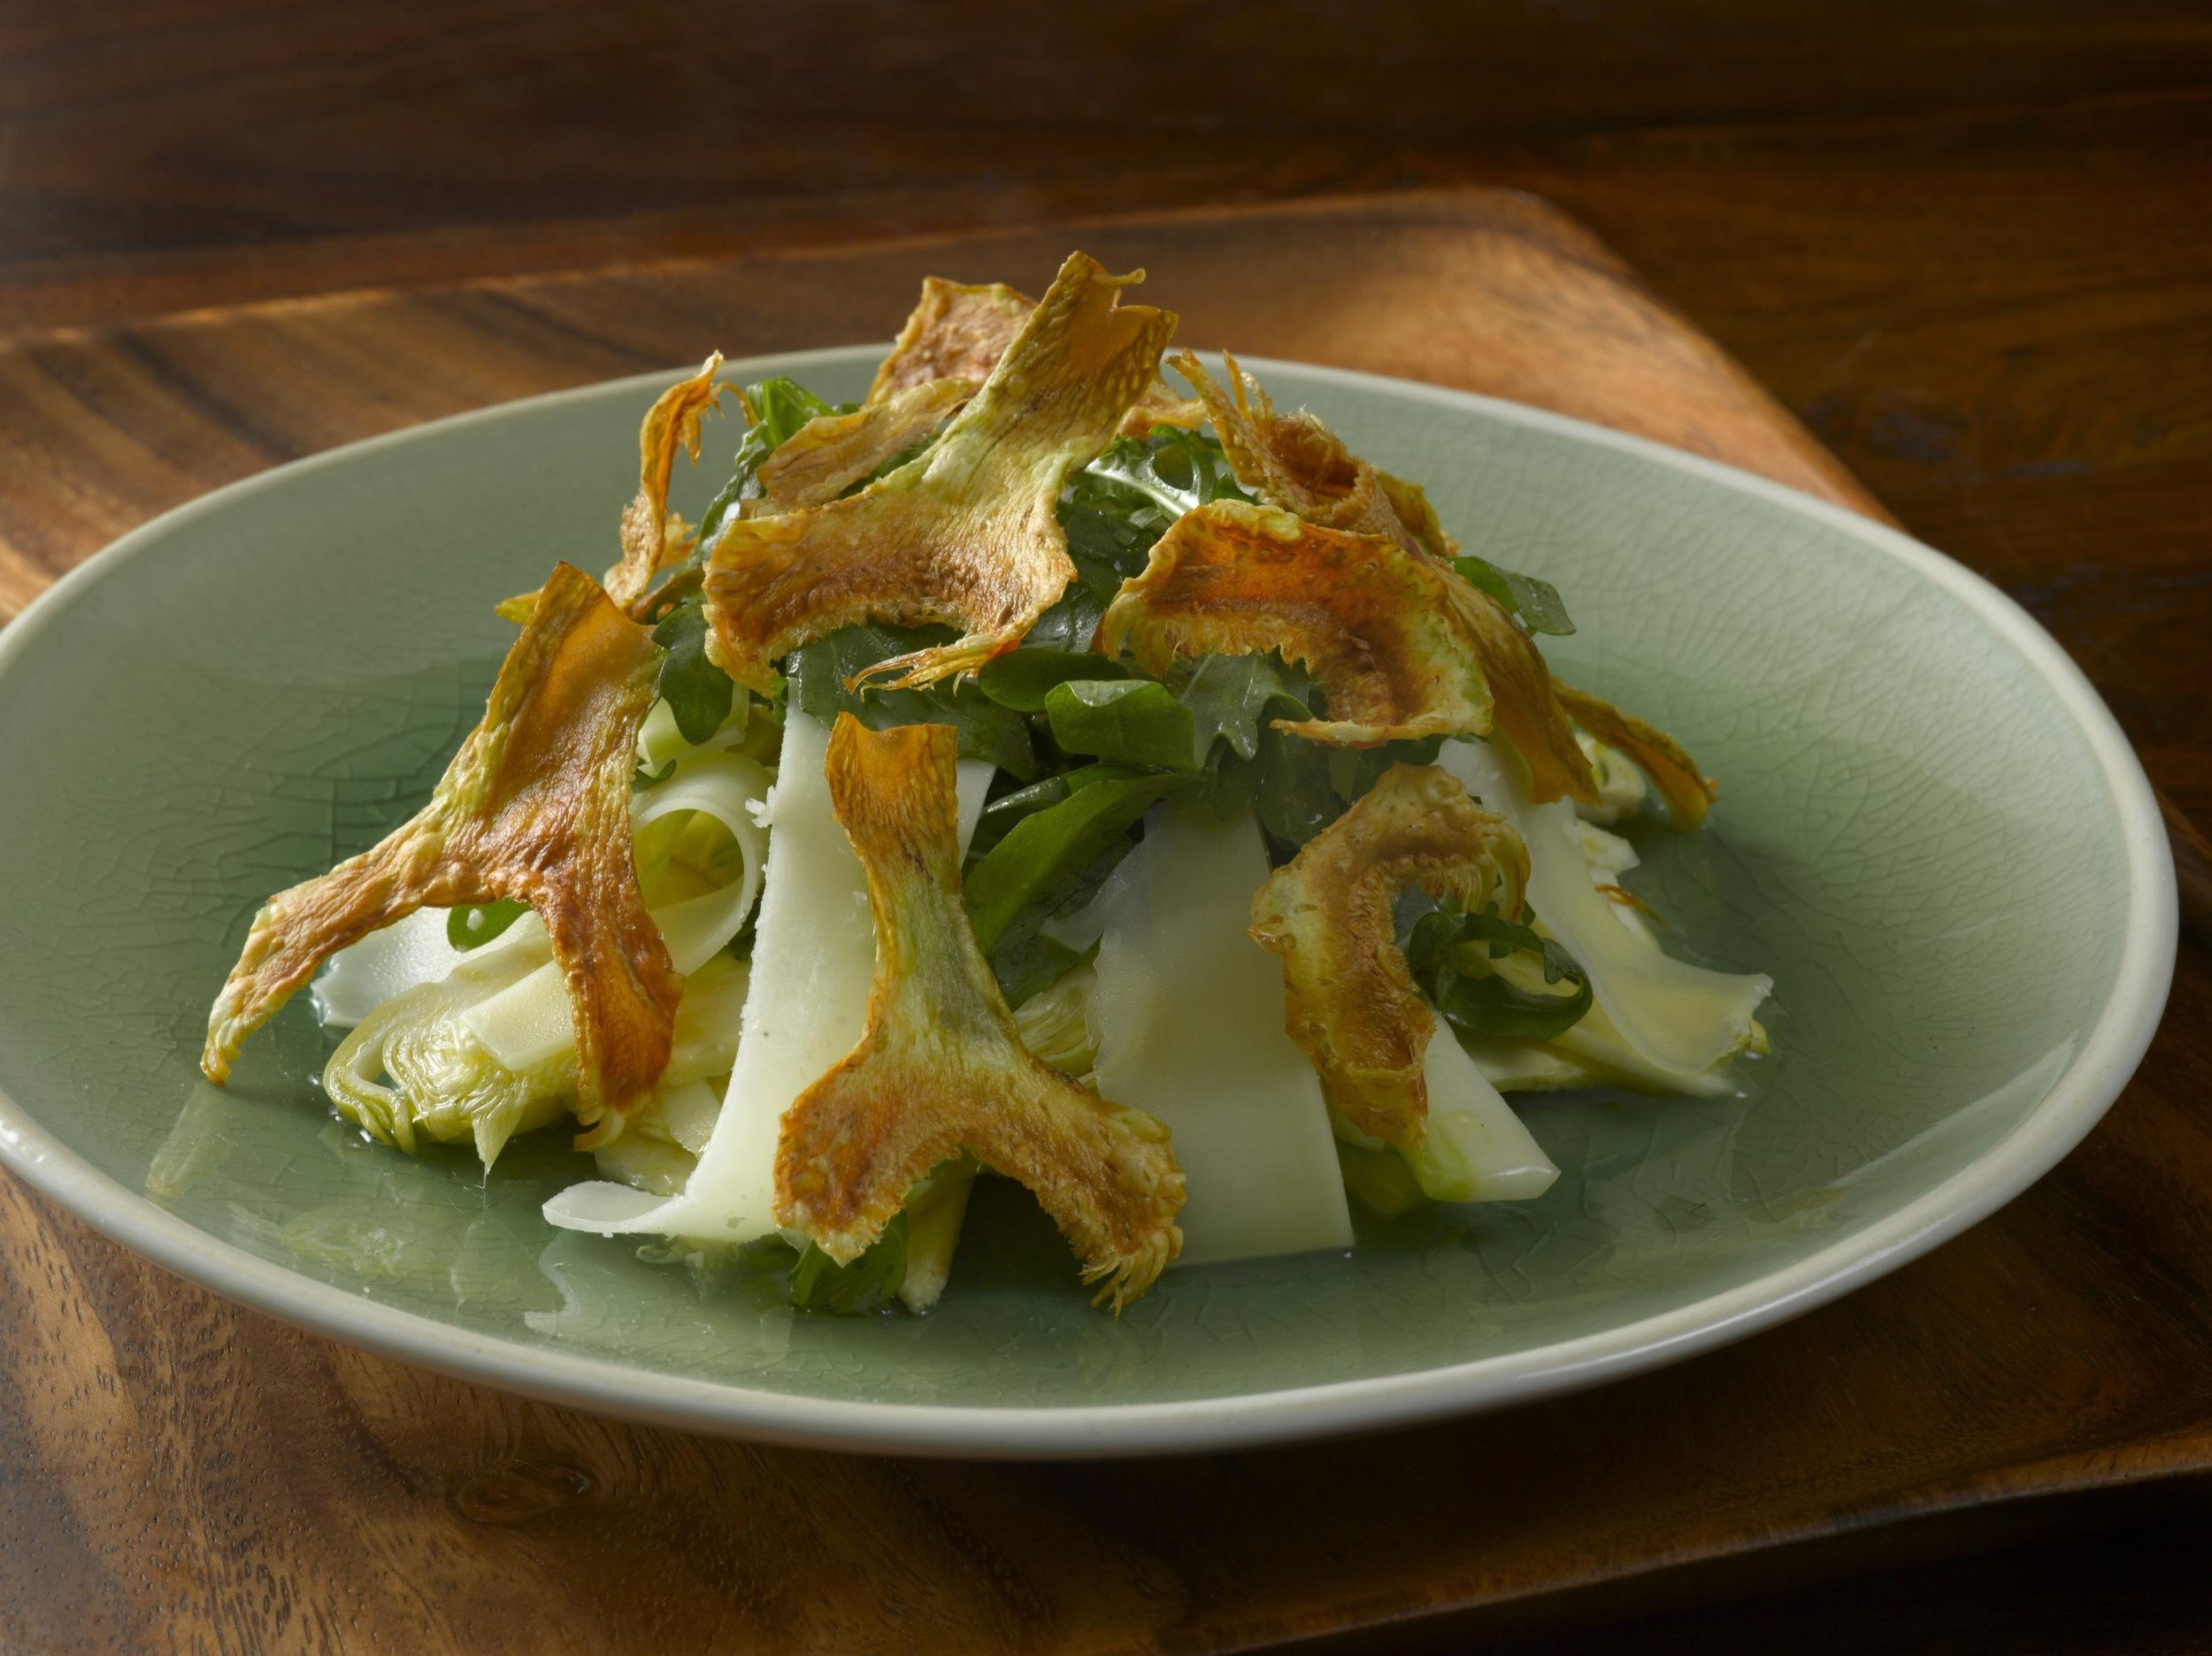 Artichoke Salad with Pecorino